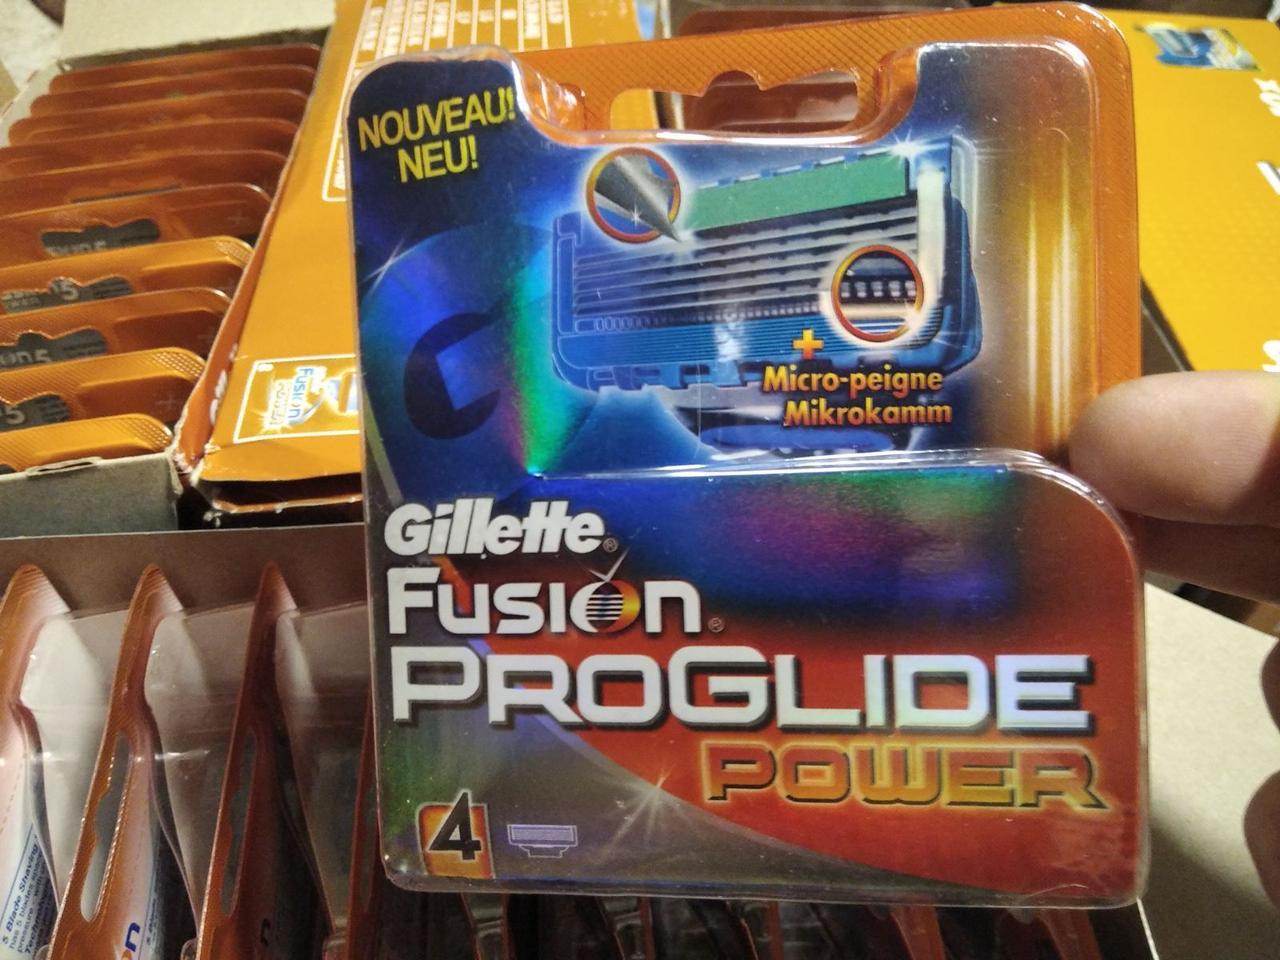 Леза.касети, картриджі Gillette Fusion Proglide Power 4 шт / Жилет Ф'южн Проглайд Павер